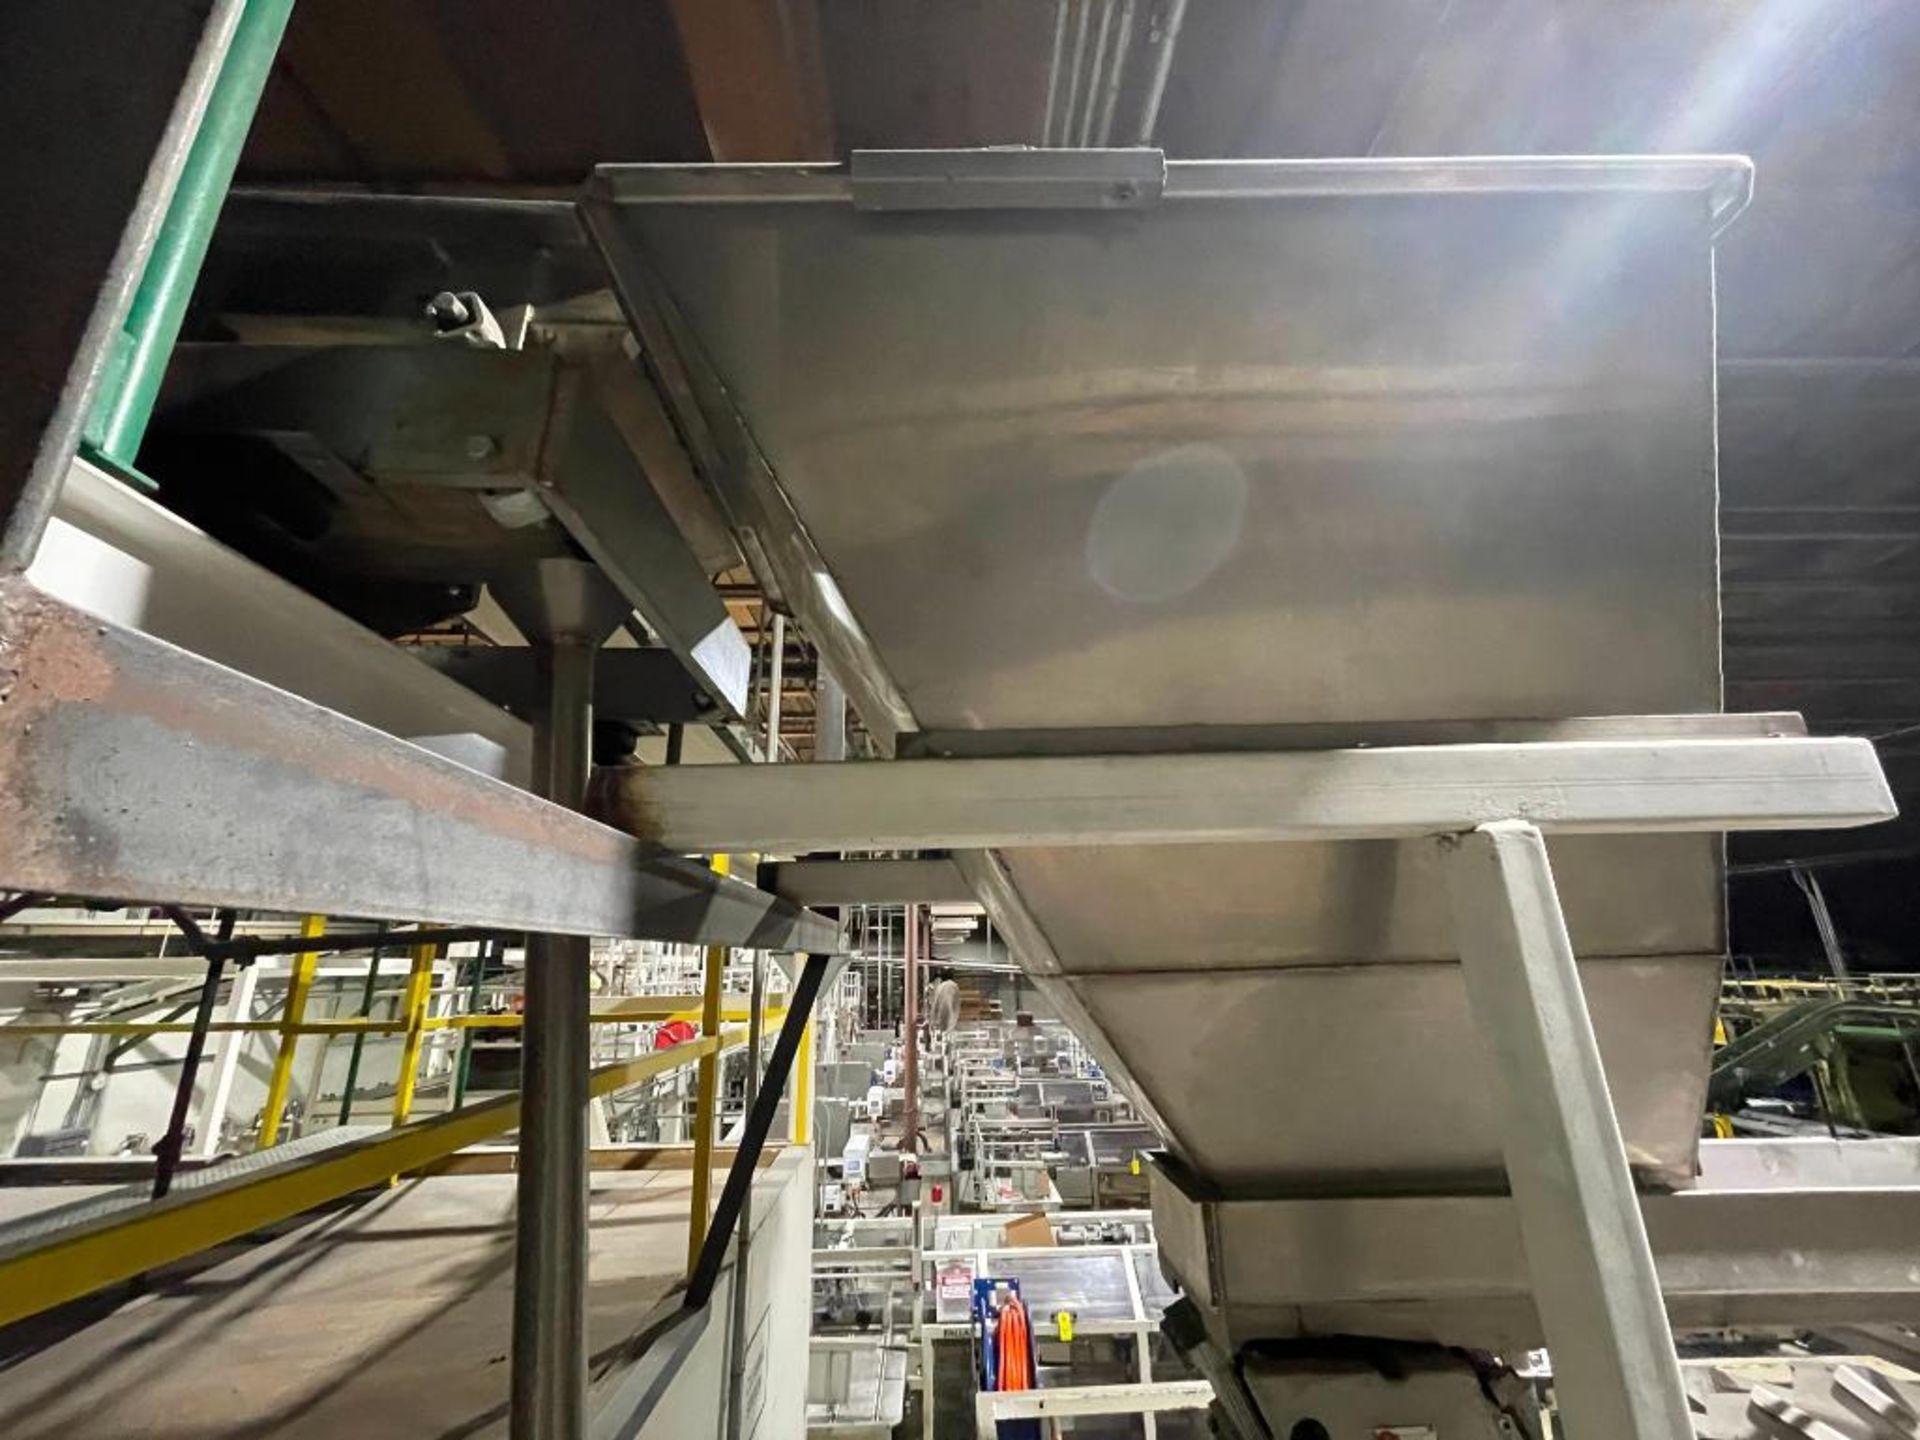 Eriez vibratory conveyor - Image 6 of 12